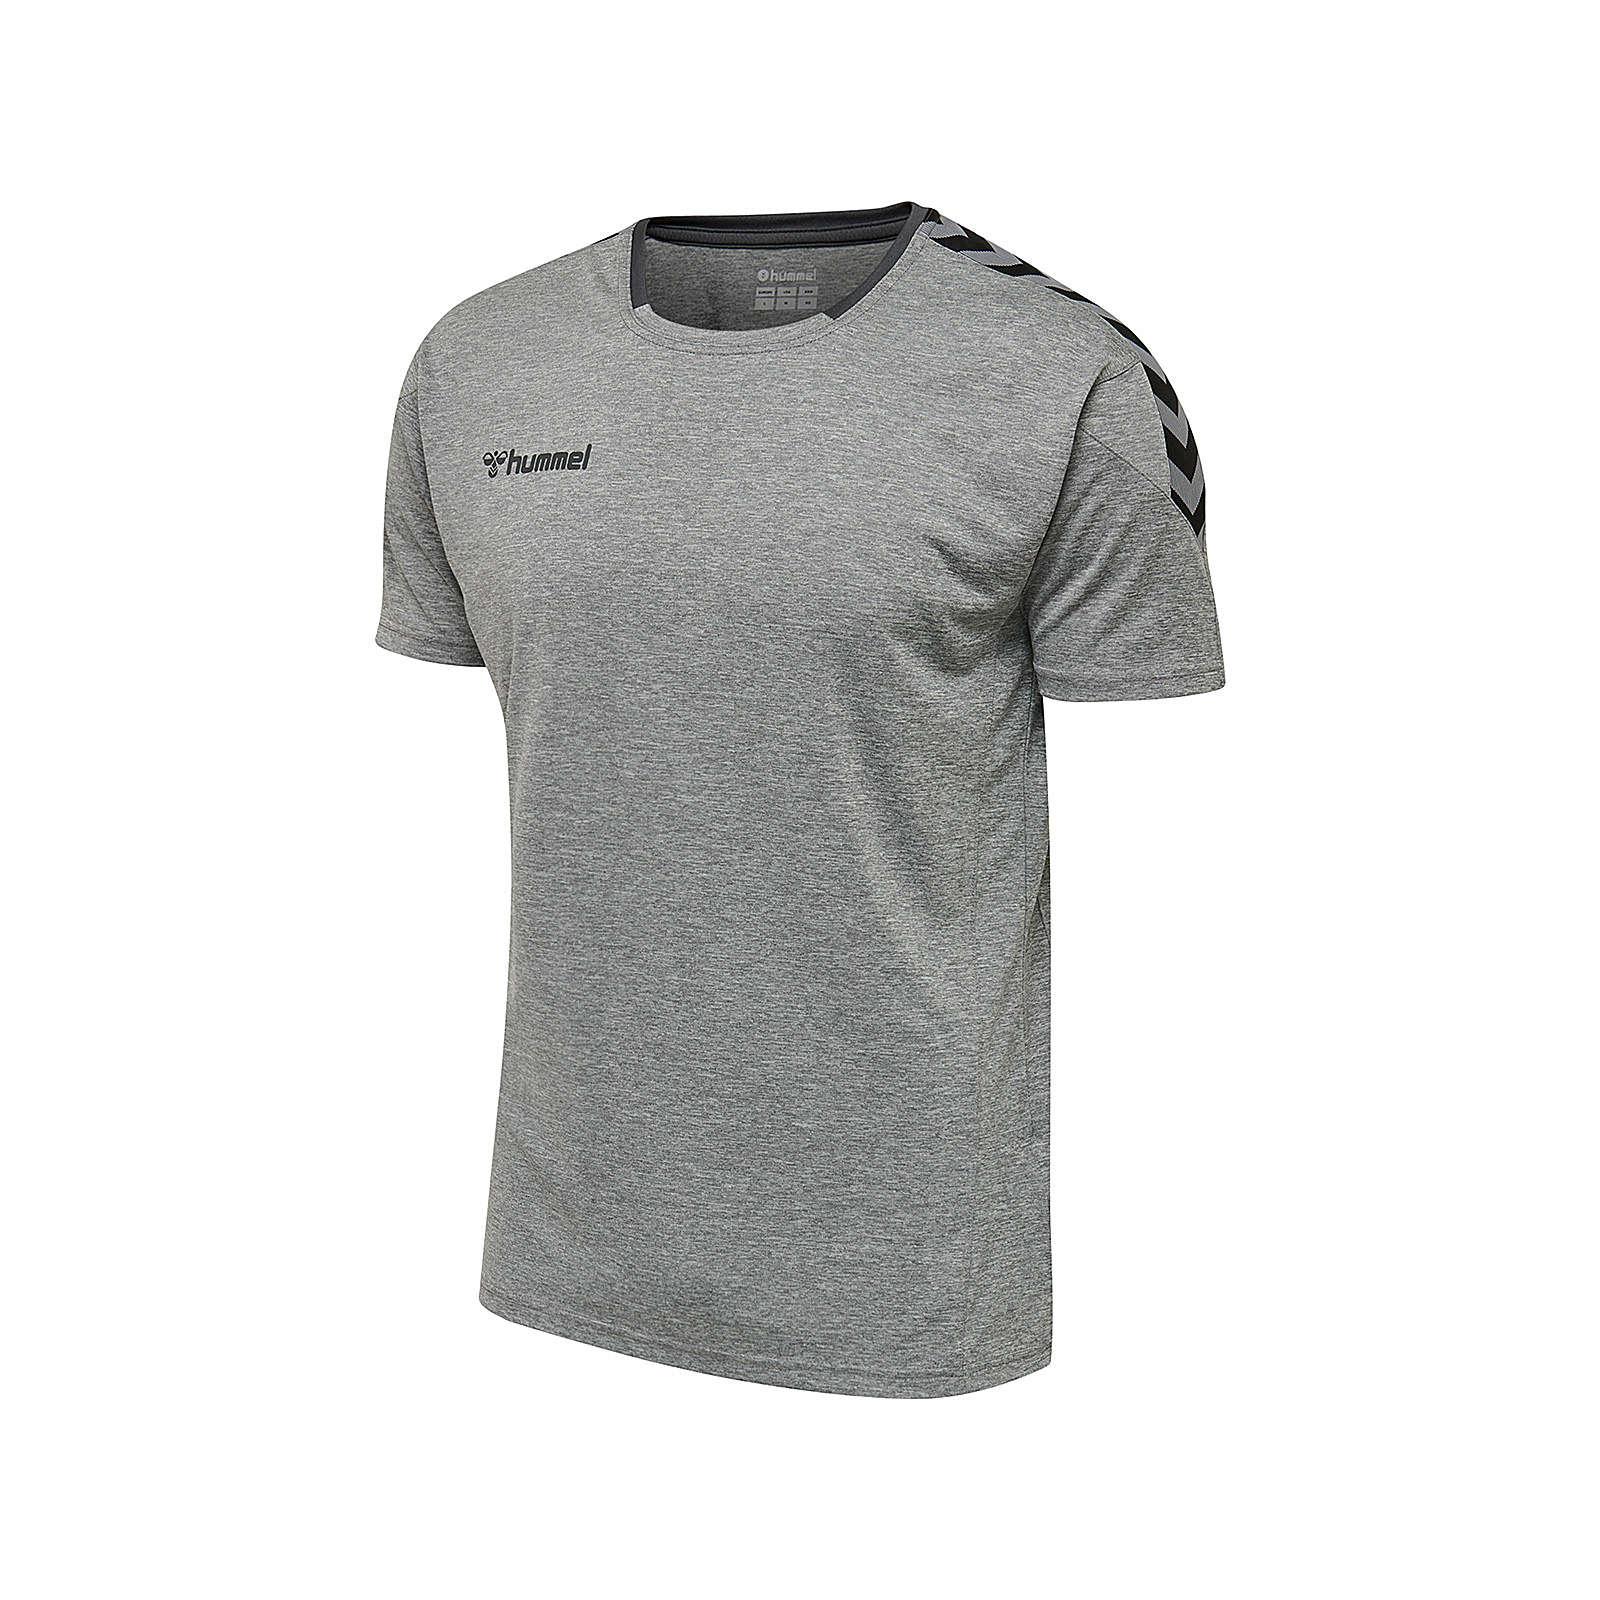 hummel hmlAUTHENTIC POLY JERSEY S/S T-Shirts grau Herren Gr. 44